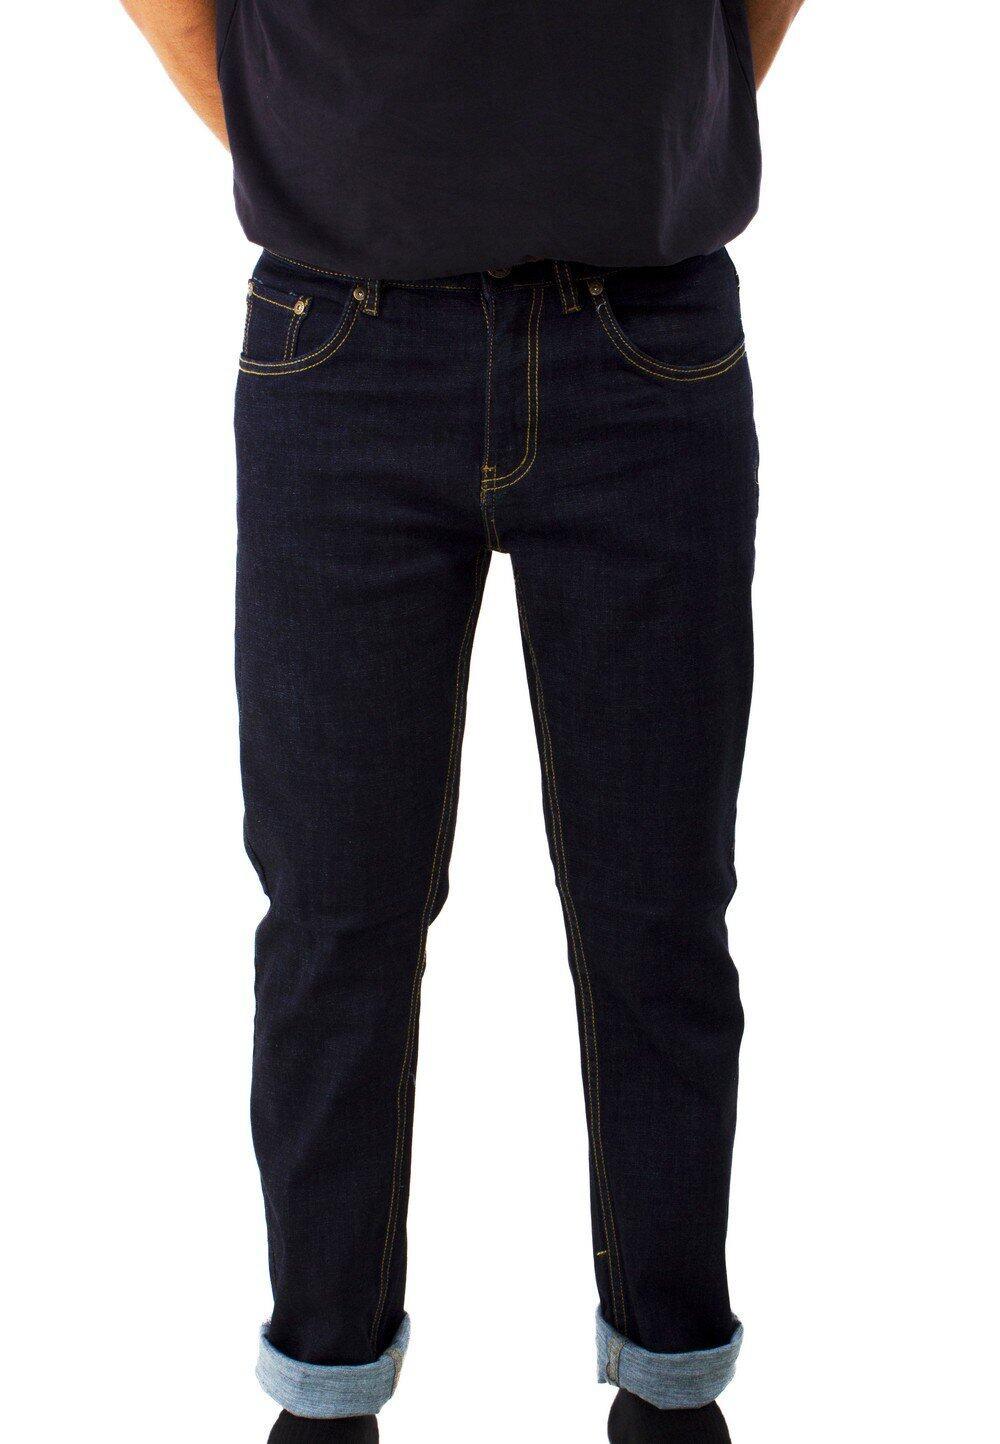 Stretchable Slim Fit Denim Long Pants 772